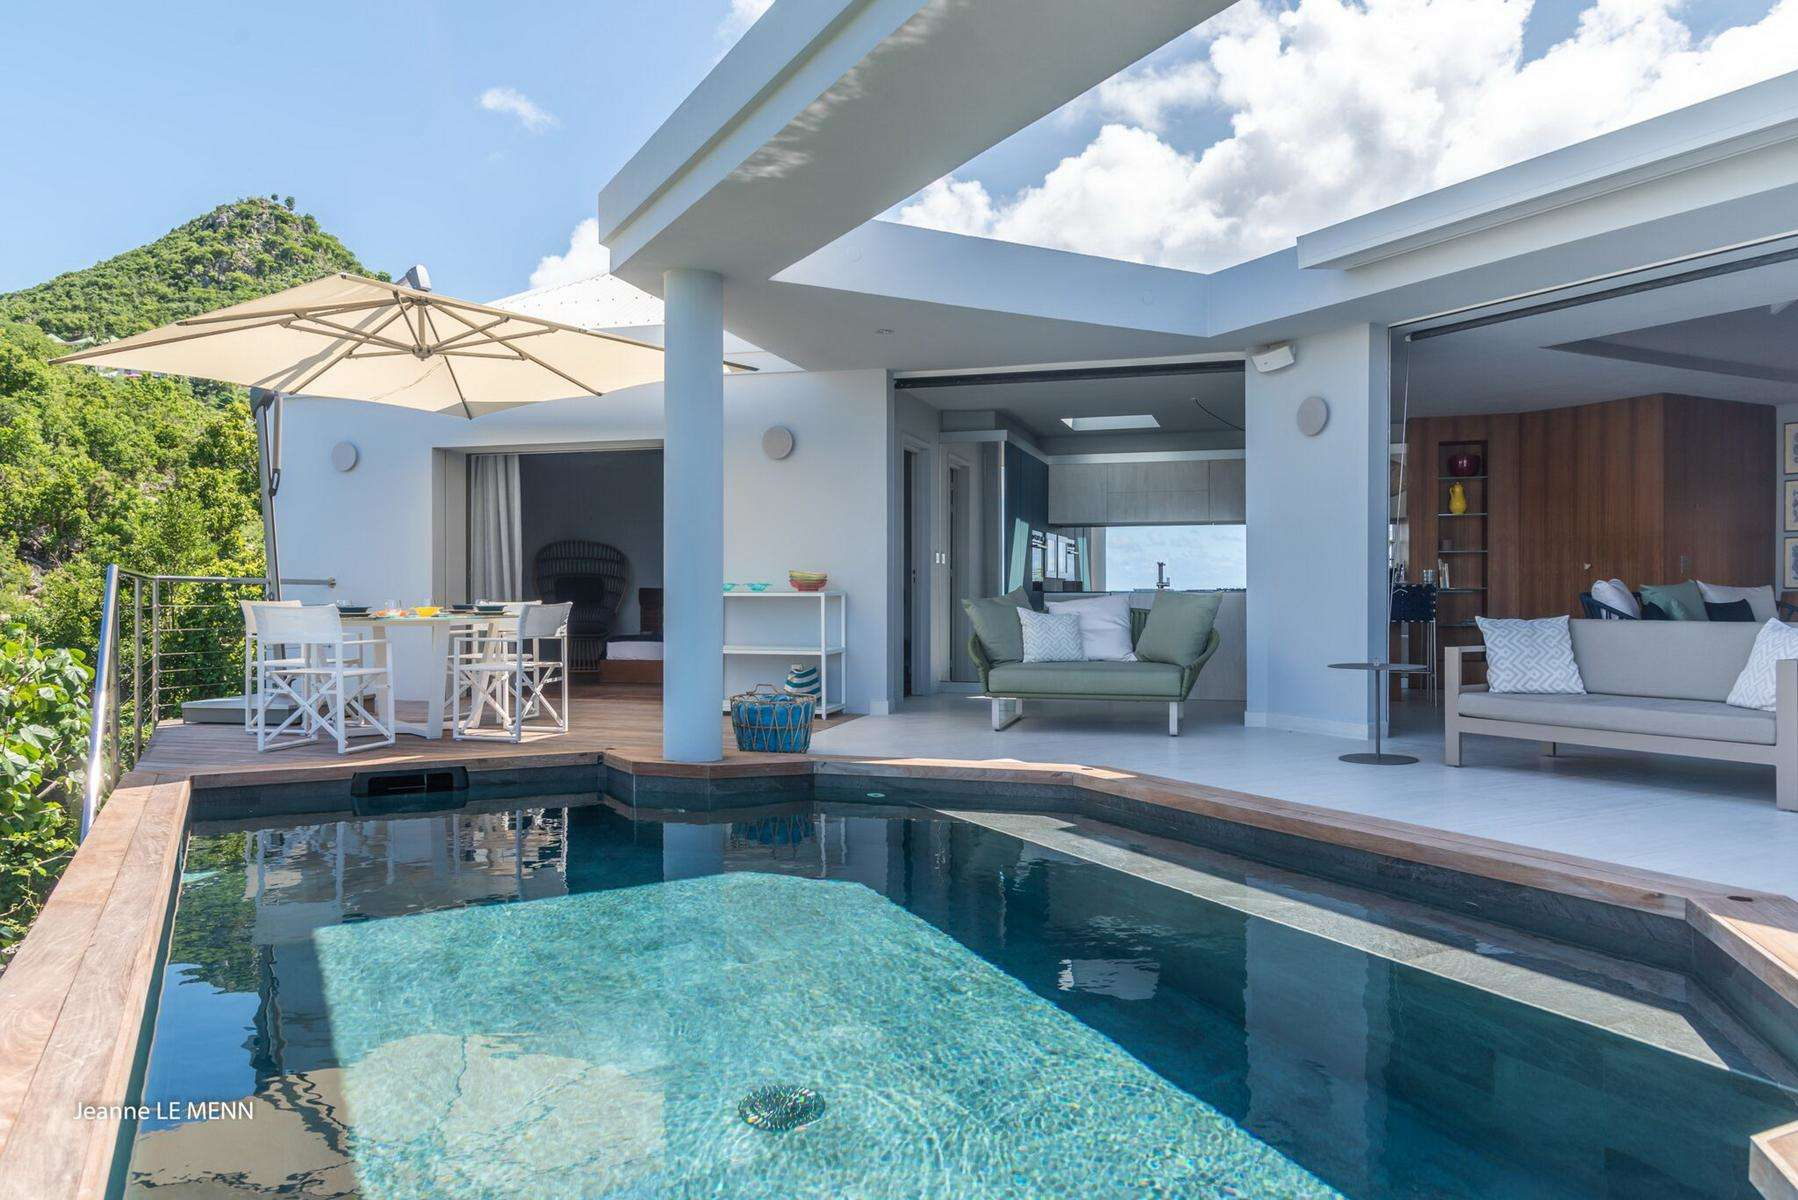 Luxury villa rentals caribbean - St barthelemy - Flamands - No location 4 - Magic Bird - Image 1/25